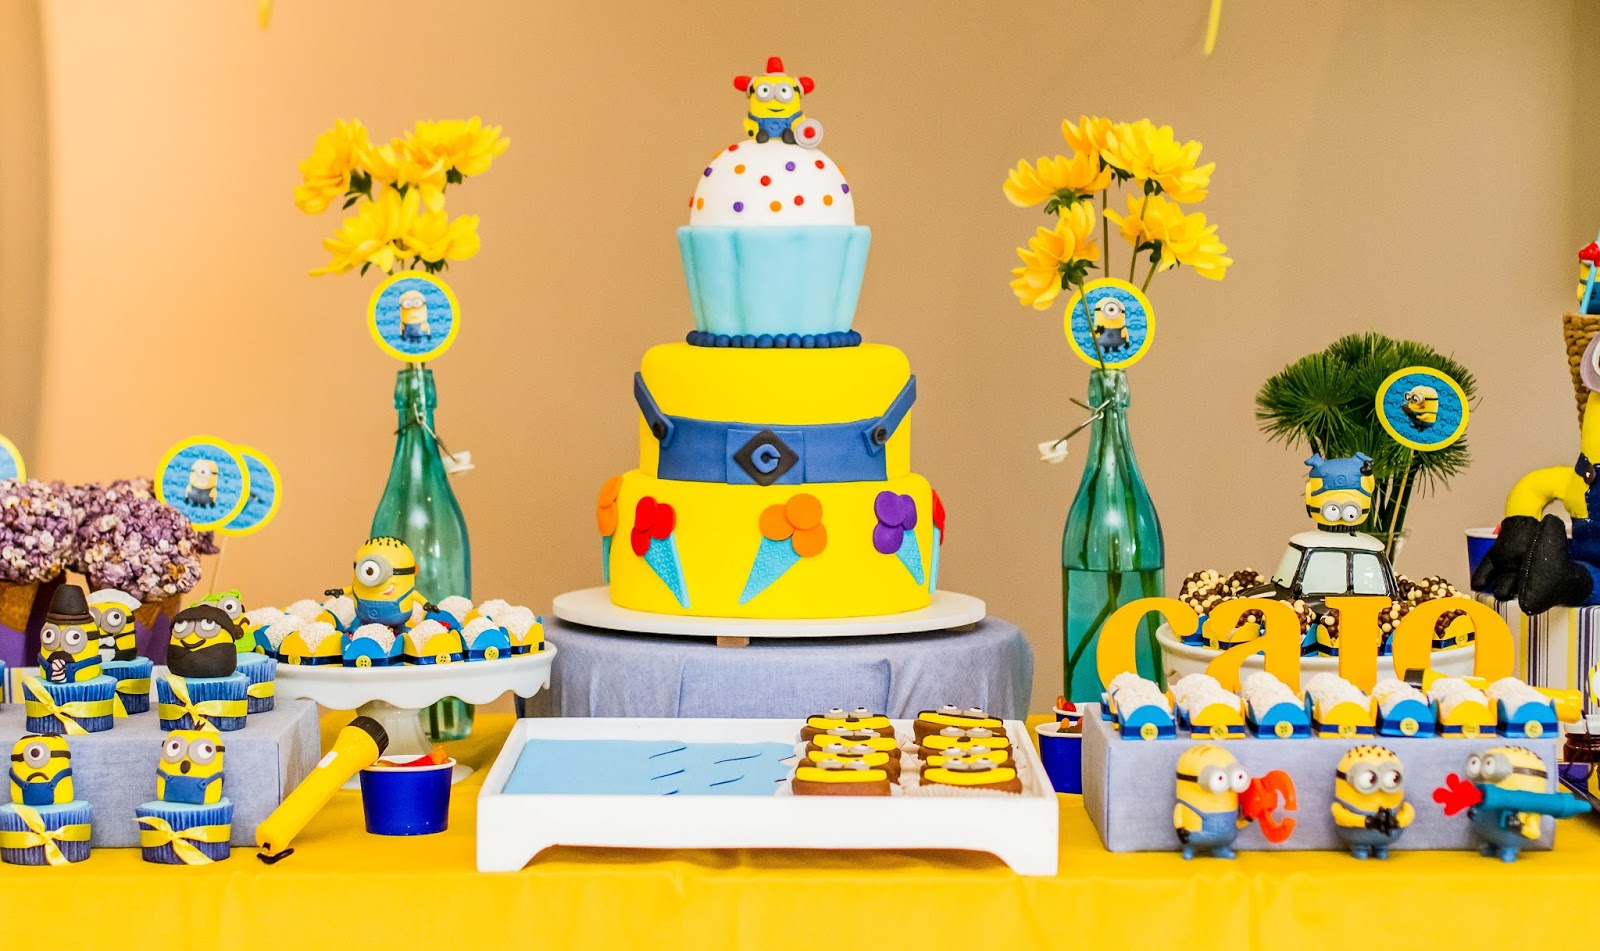 decoracao festa minions : decoracao festa minions:Divina Festivitá: Festa Minions – Meu Malvado Favorito